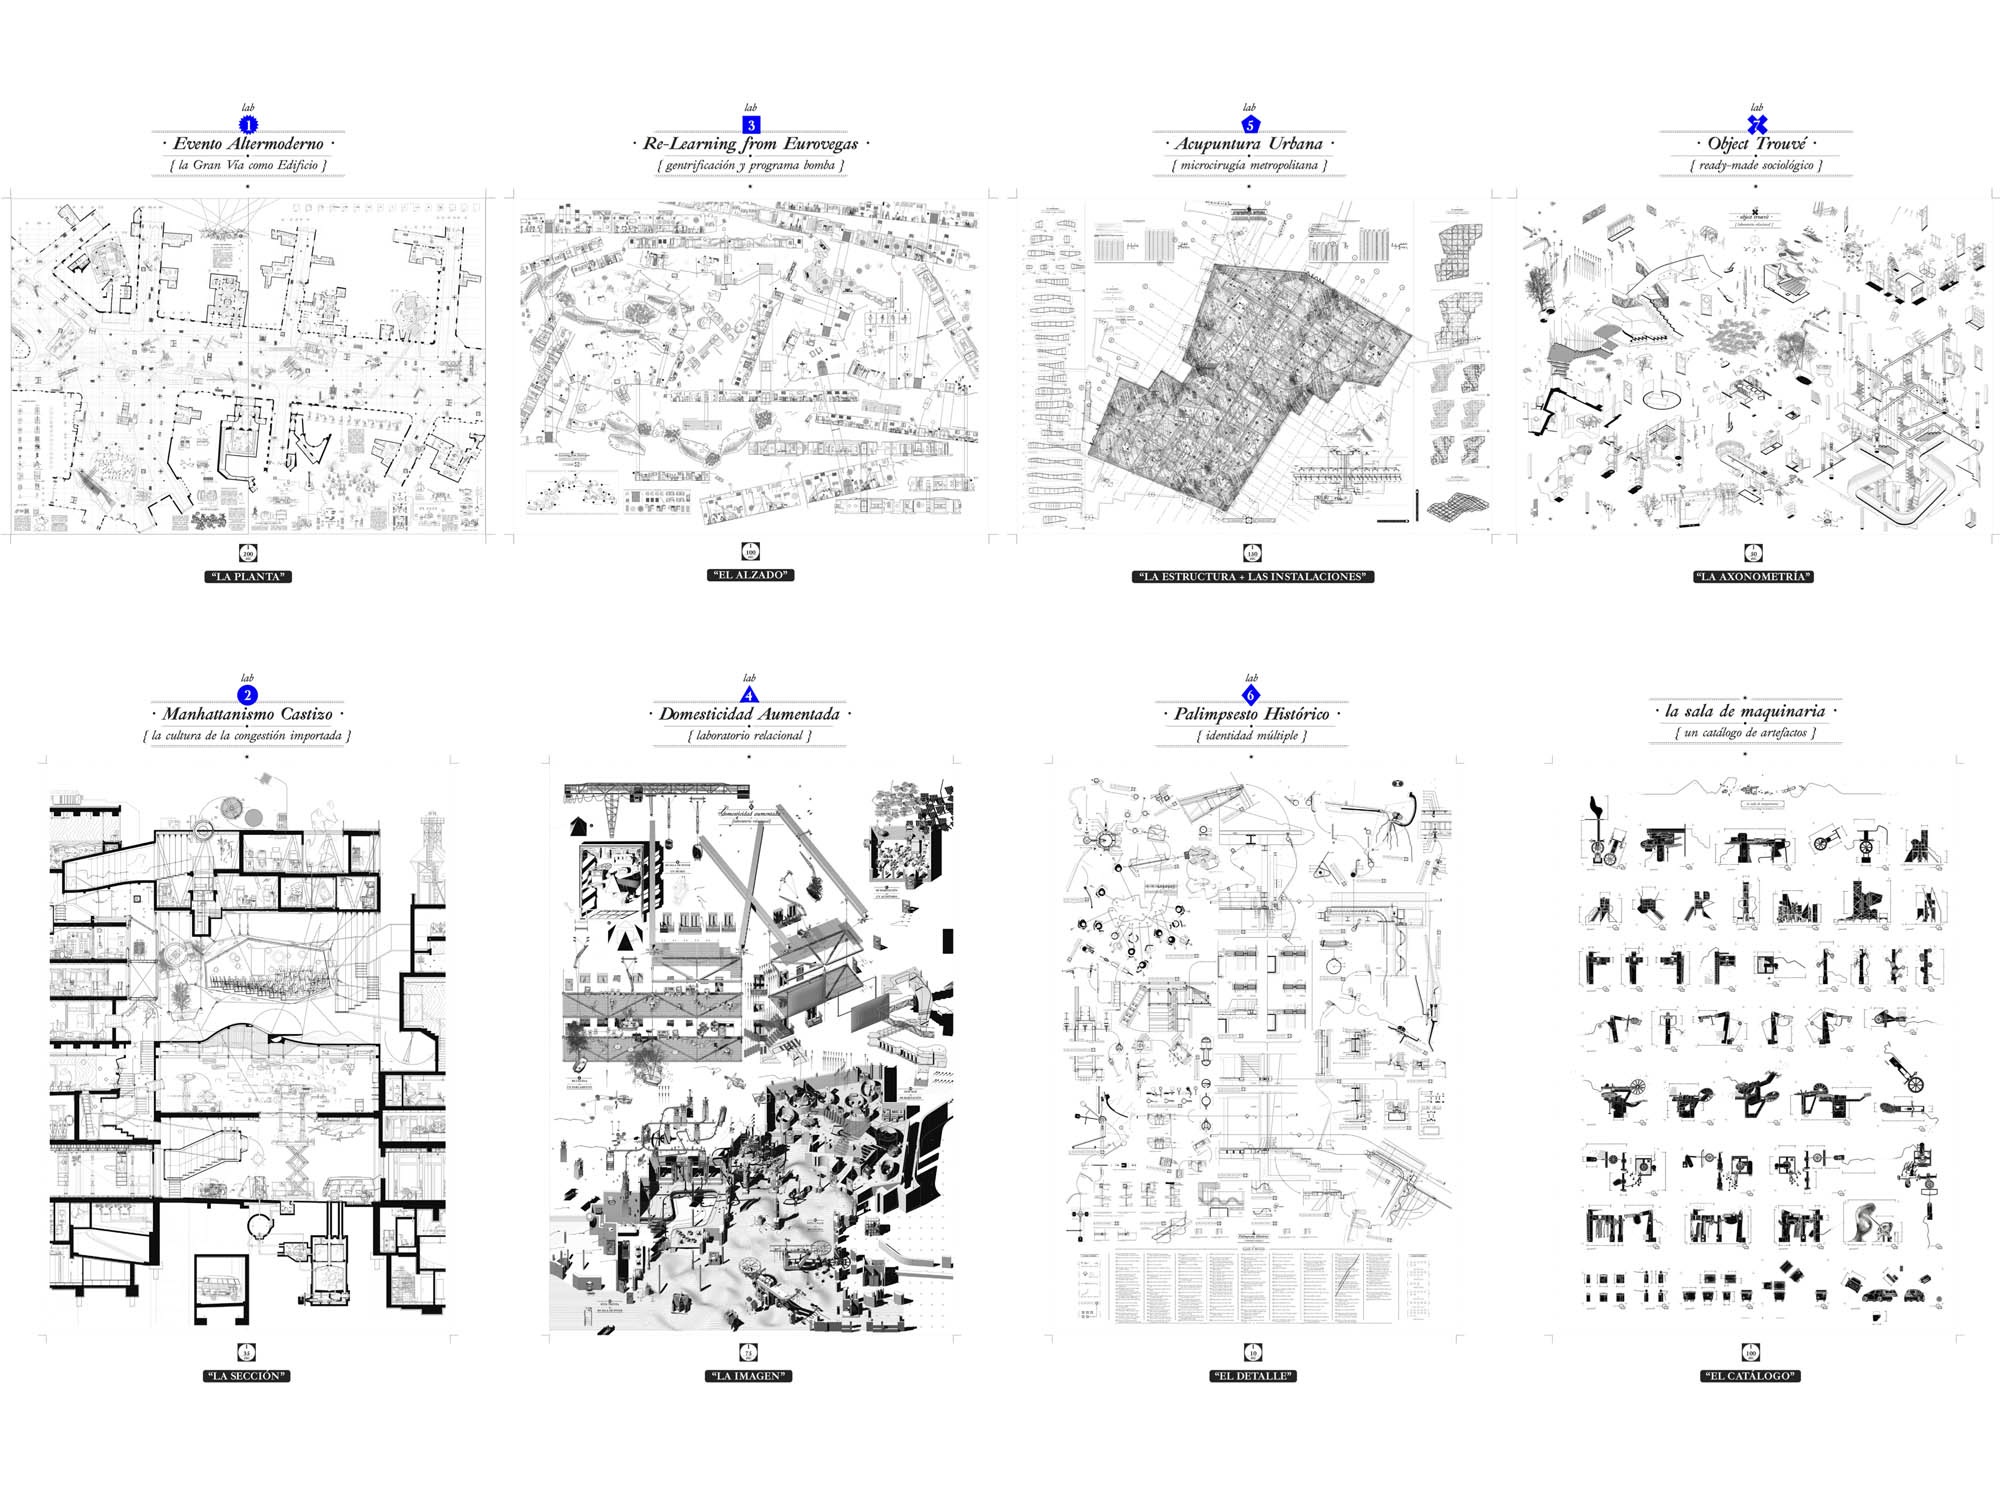 03_Seven Typologies-Seven Documents